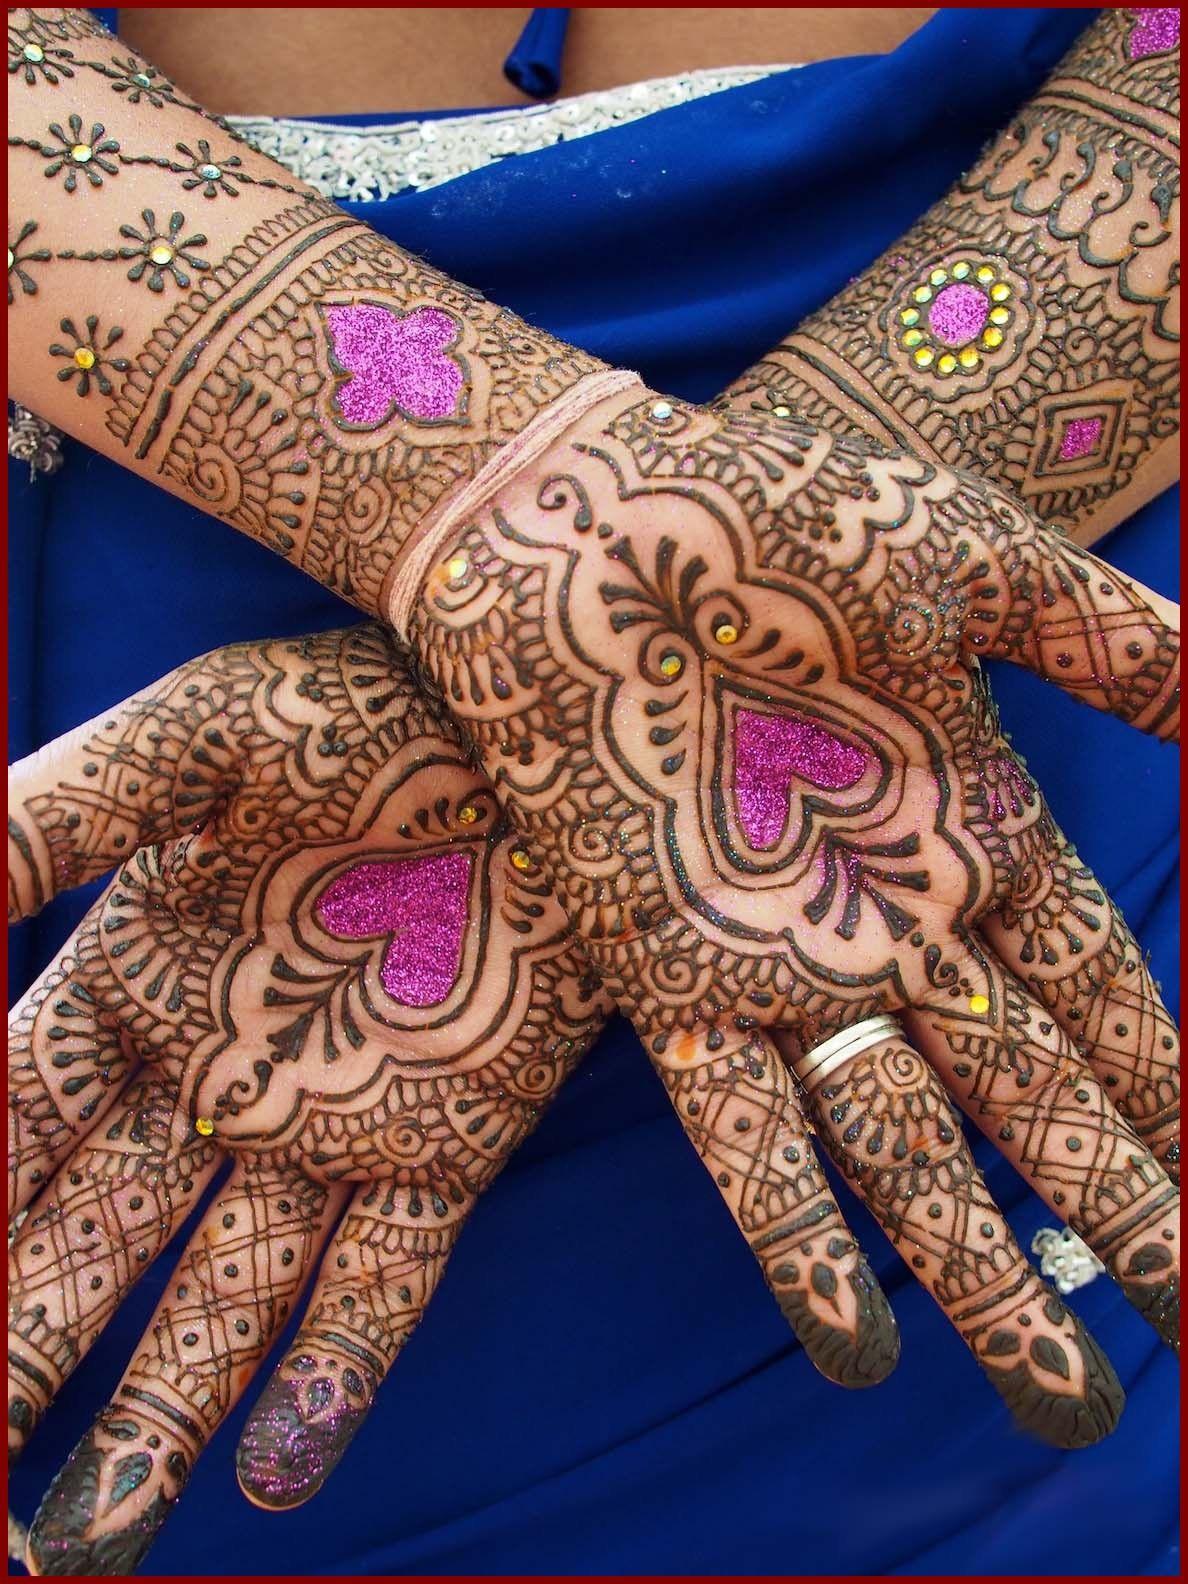 Top 10 beautiful arabic mehndi design art - Beautiful Arabic Glitter Mehndi Designs Pictures Glittermehndi